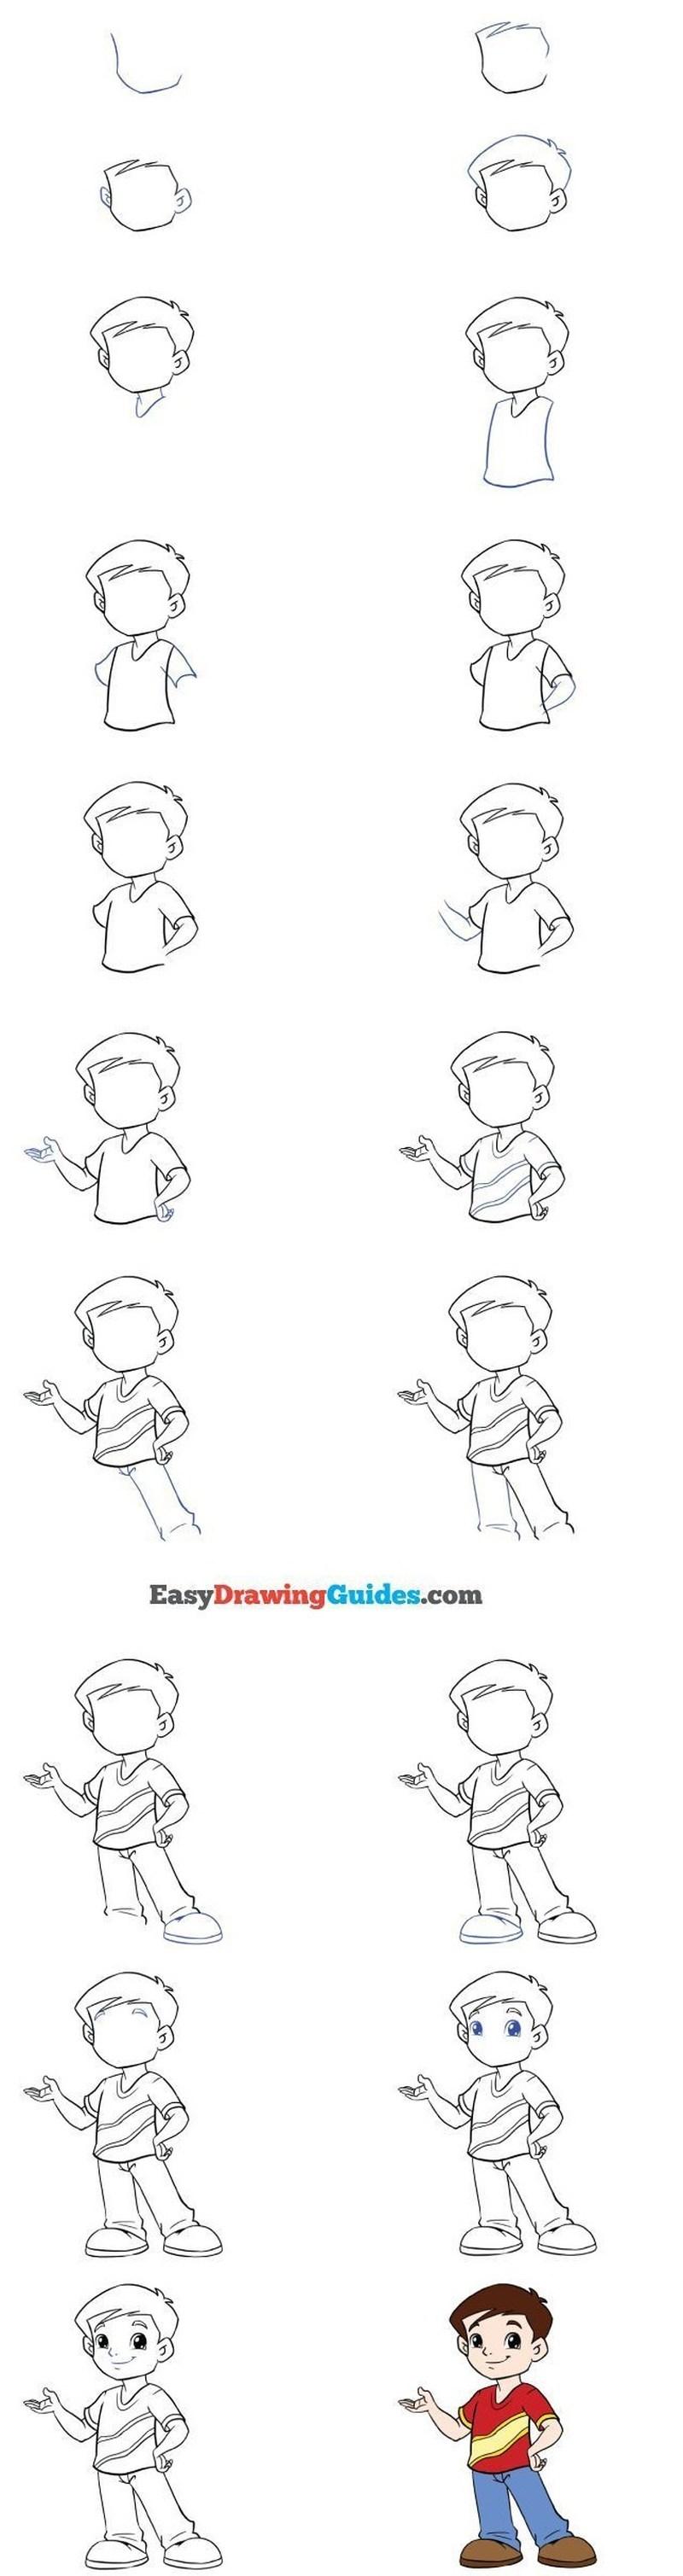 dibujos fáciles de personas paso a paso gente humanos a lápiz niño parado señalando